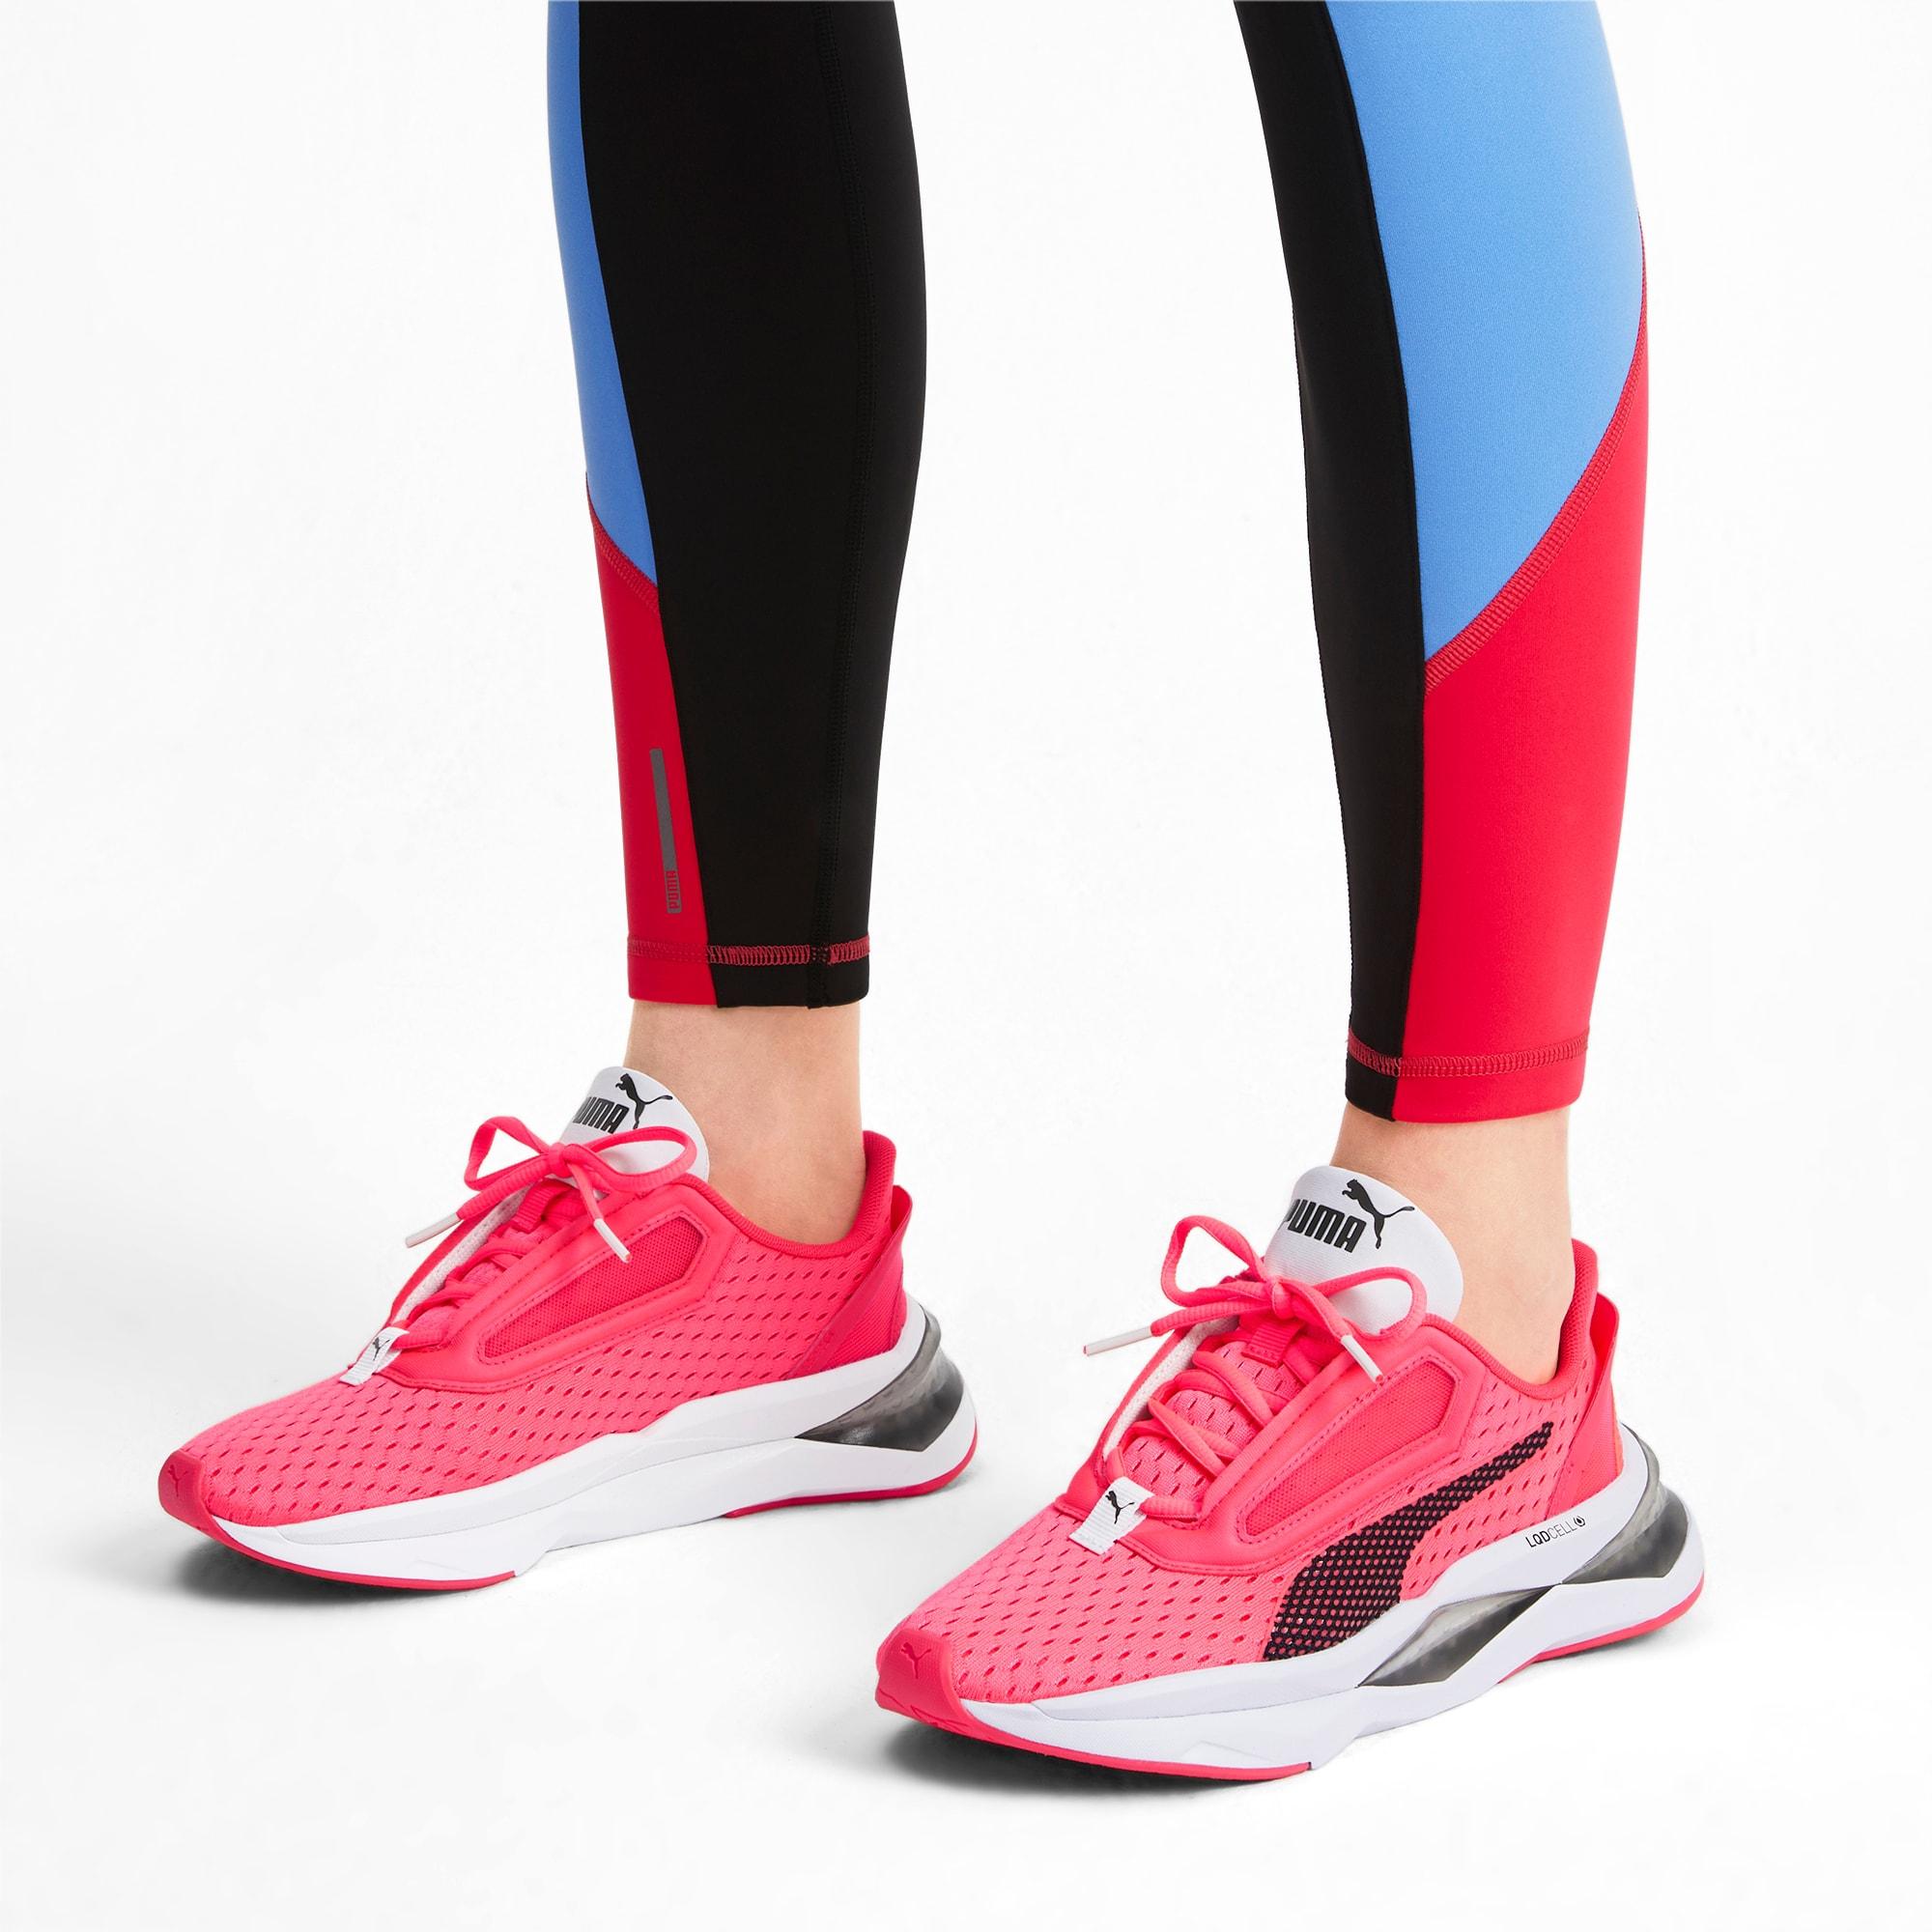 Zapatos de entrenamiento LQDCELL Shatter XT para mujer